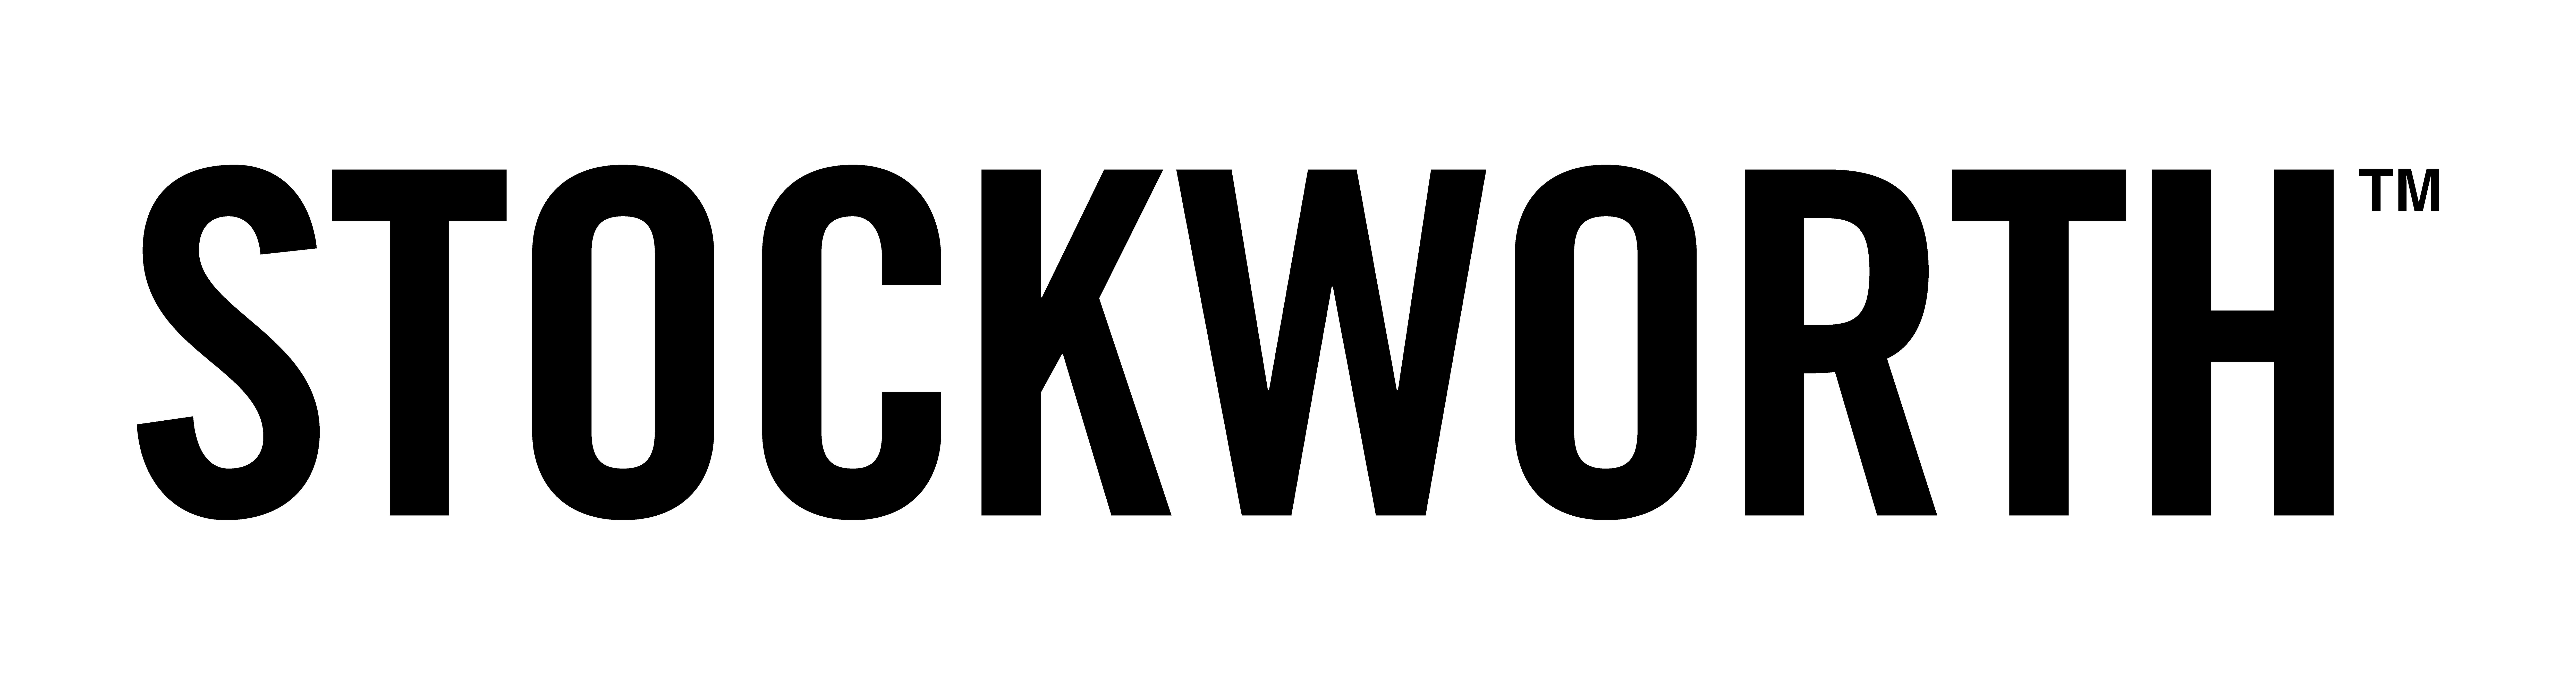 Stockworth-Badge(WhiteTransparent)